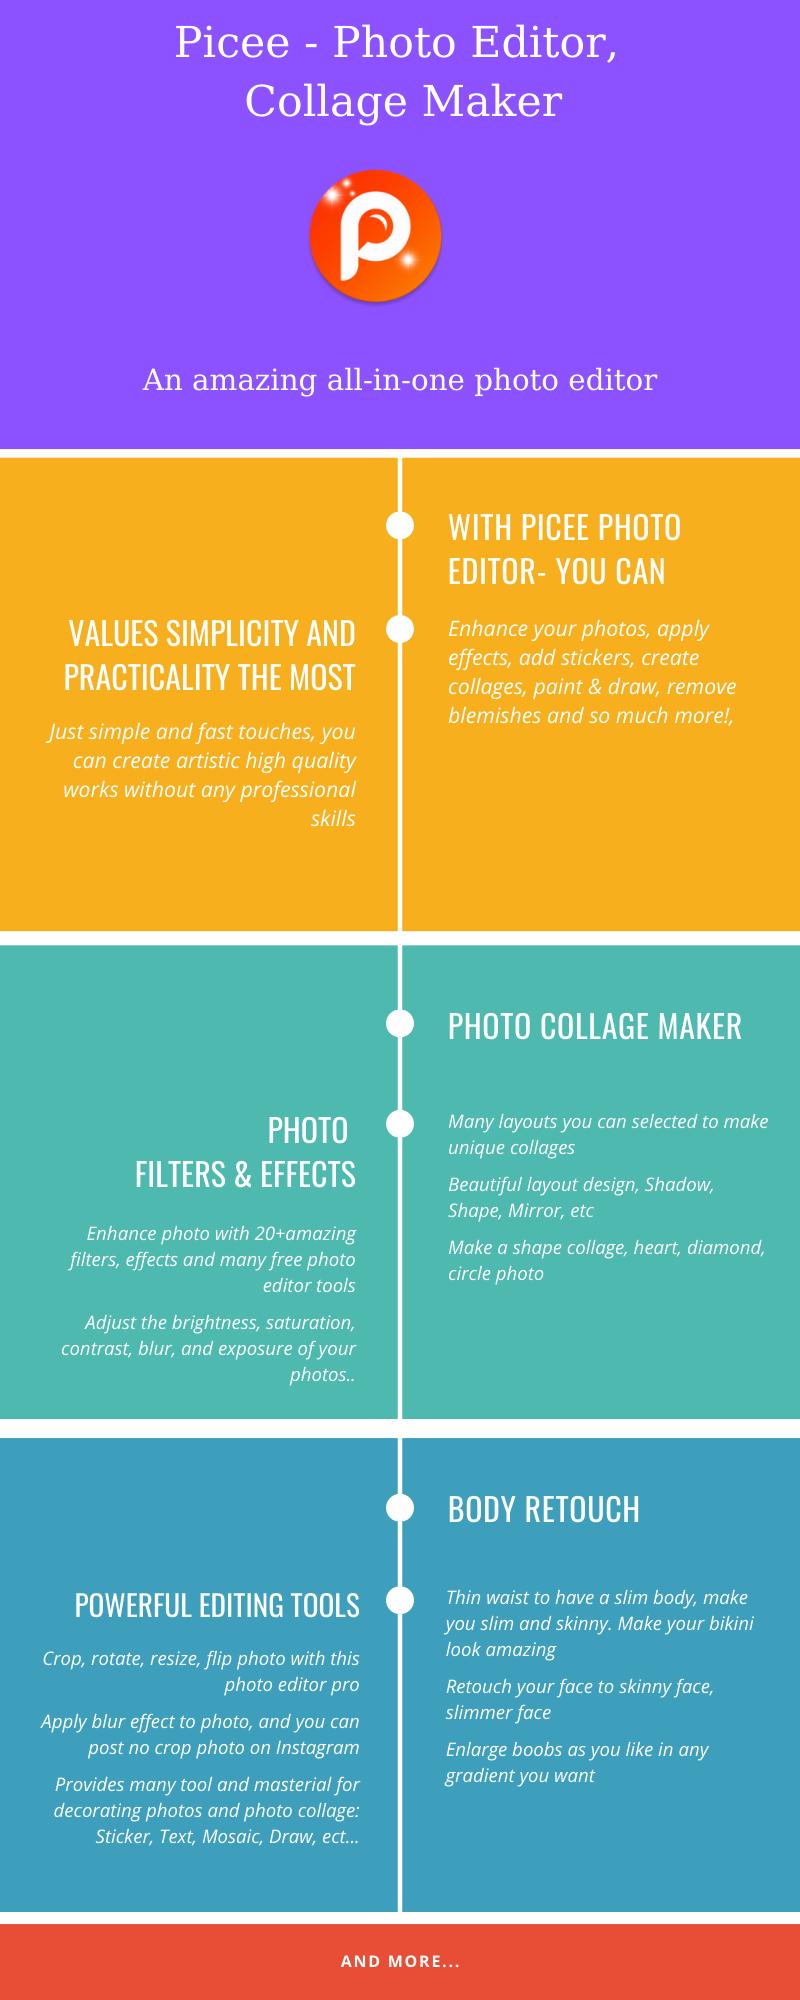 Picee - Photo Editor, Collage Maker - 2